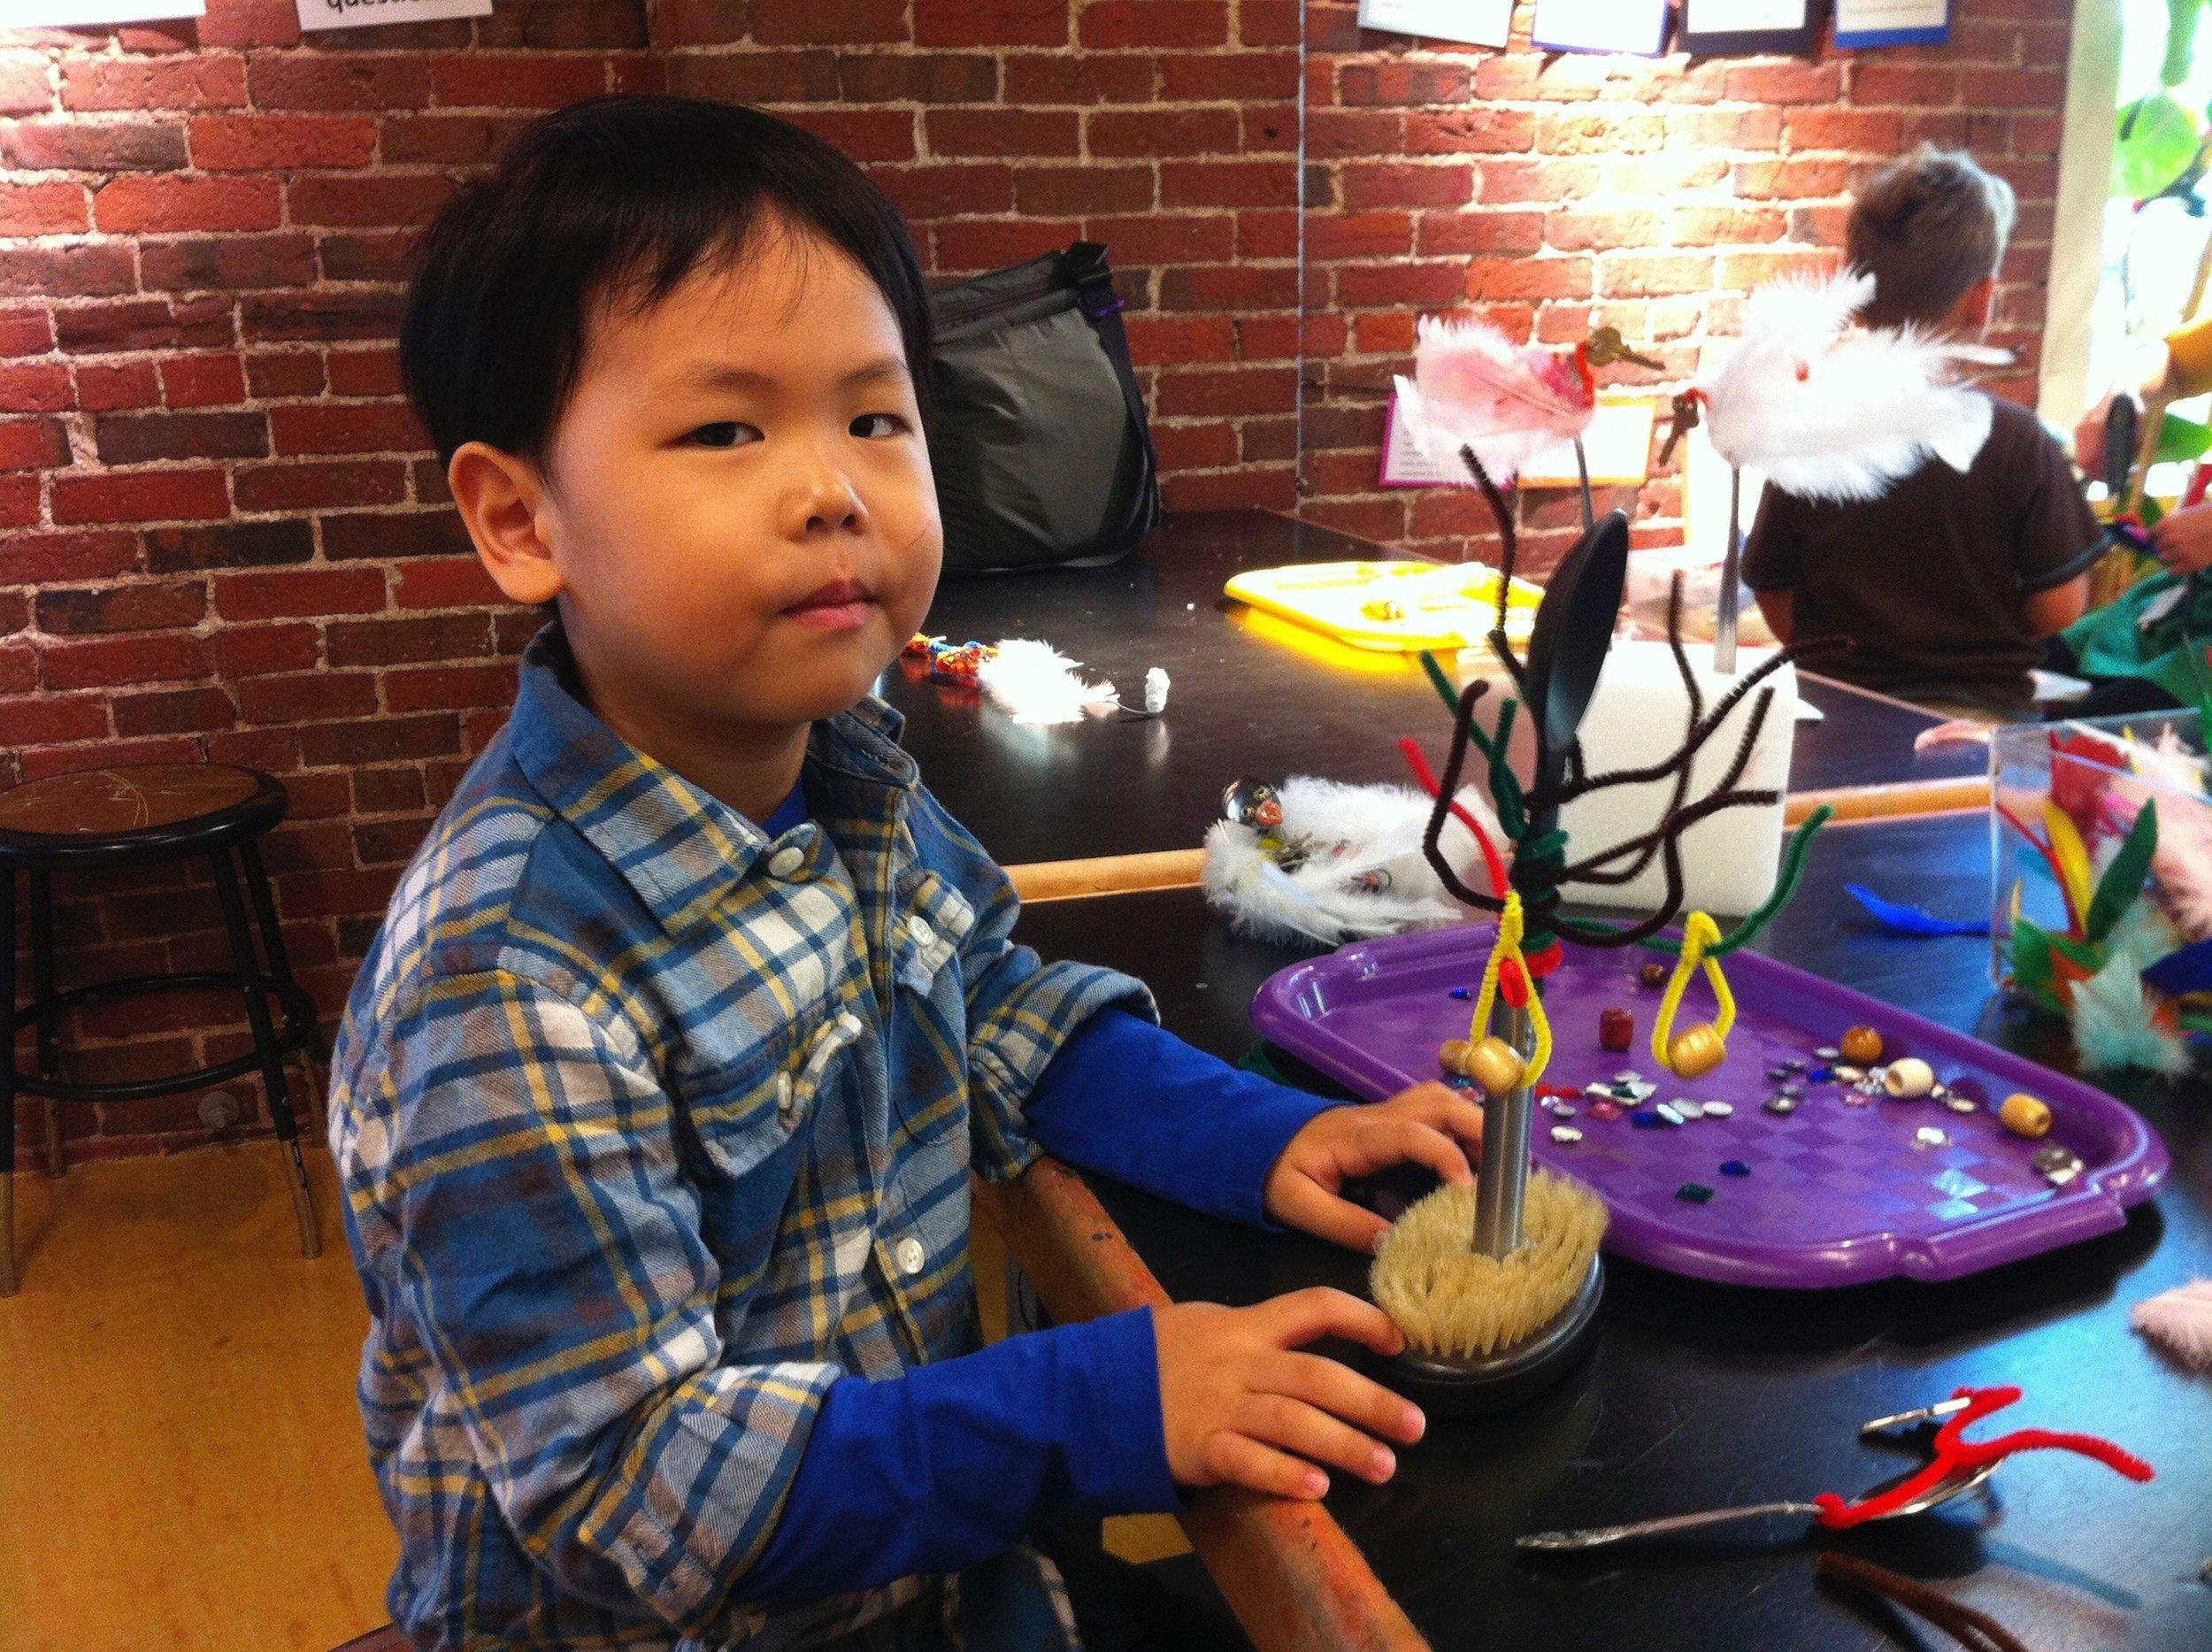 Visiting Artist at Children's Museum